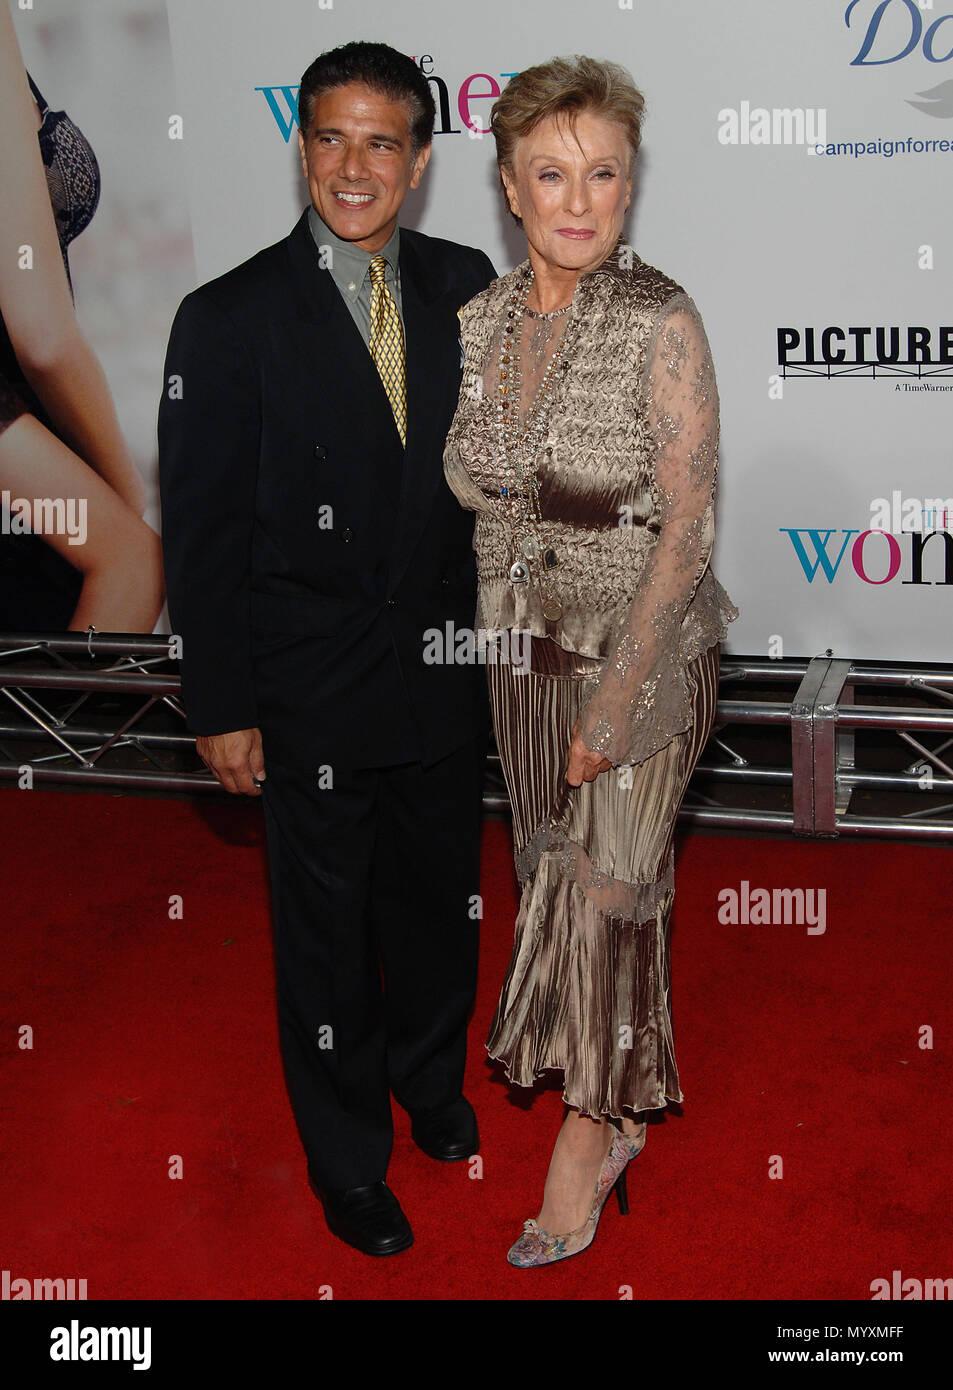 Cloris Leachman Daughter Stock Photos & Cloris Leachman Daughter